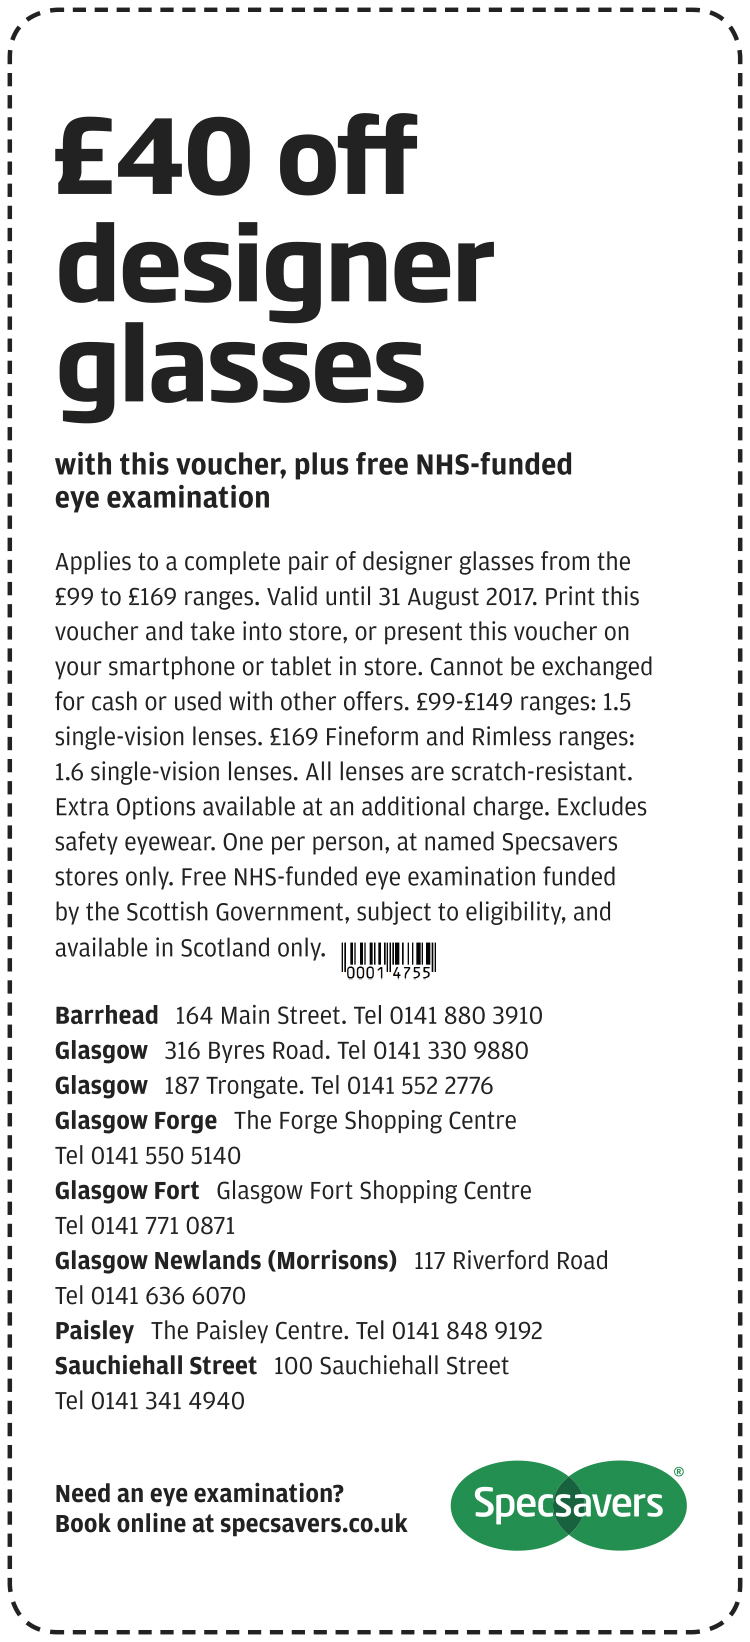 £40 off designer glasses - Glasgow